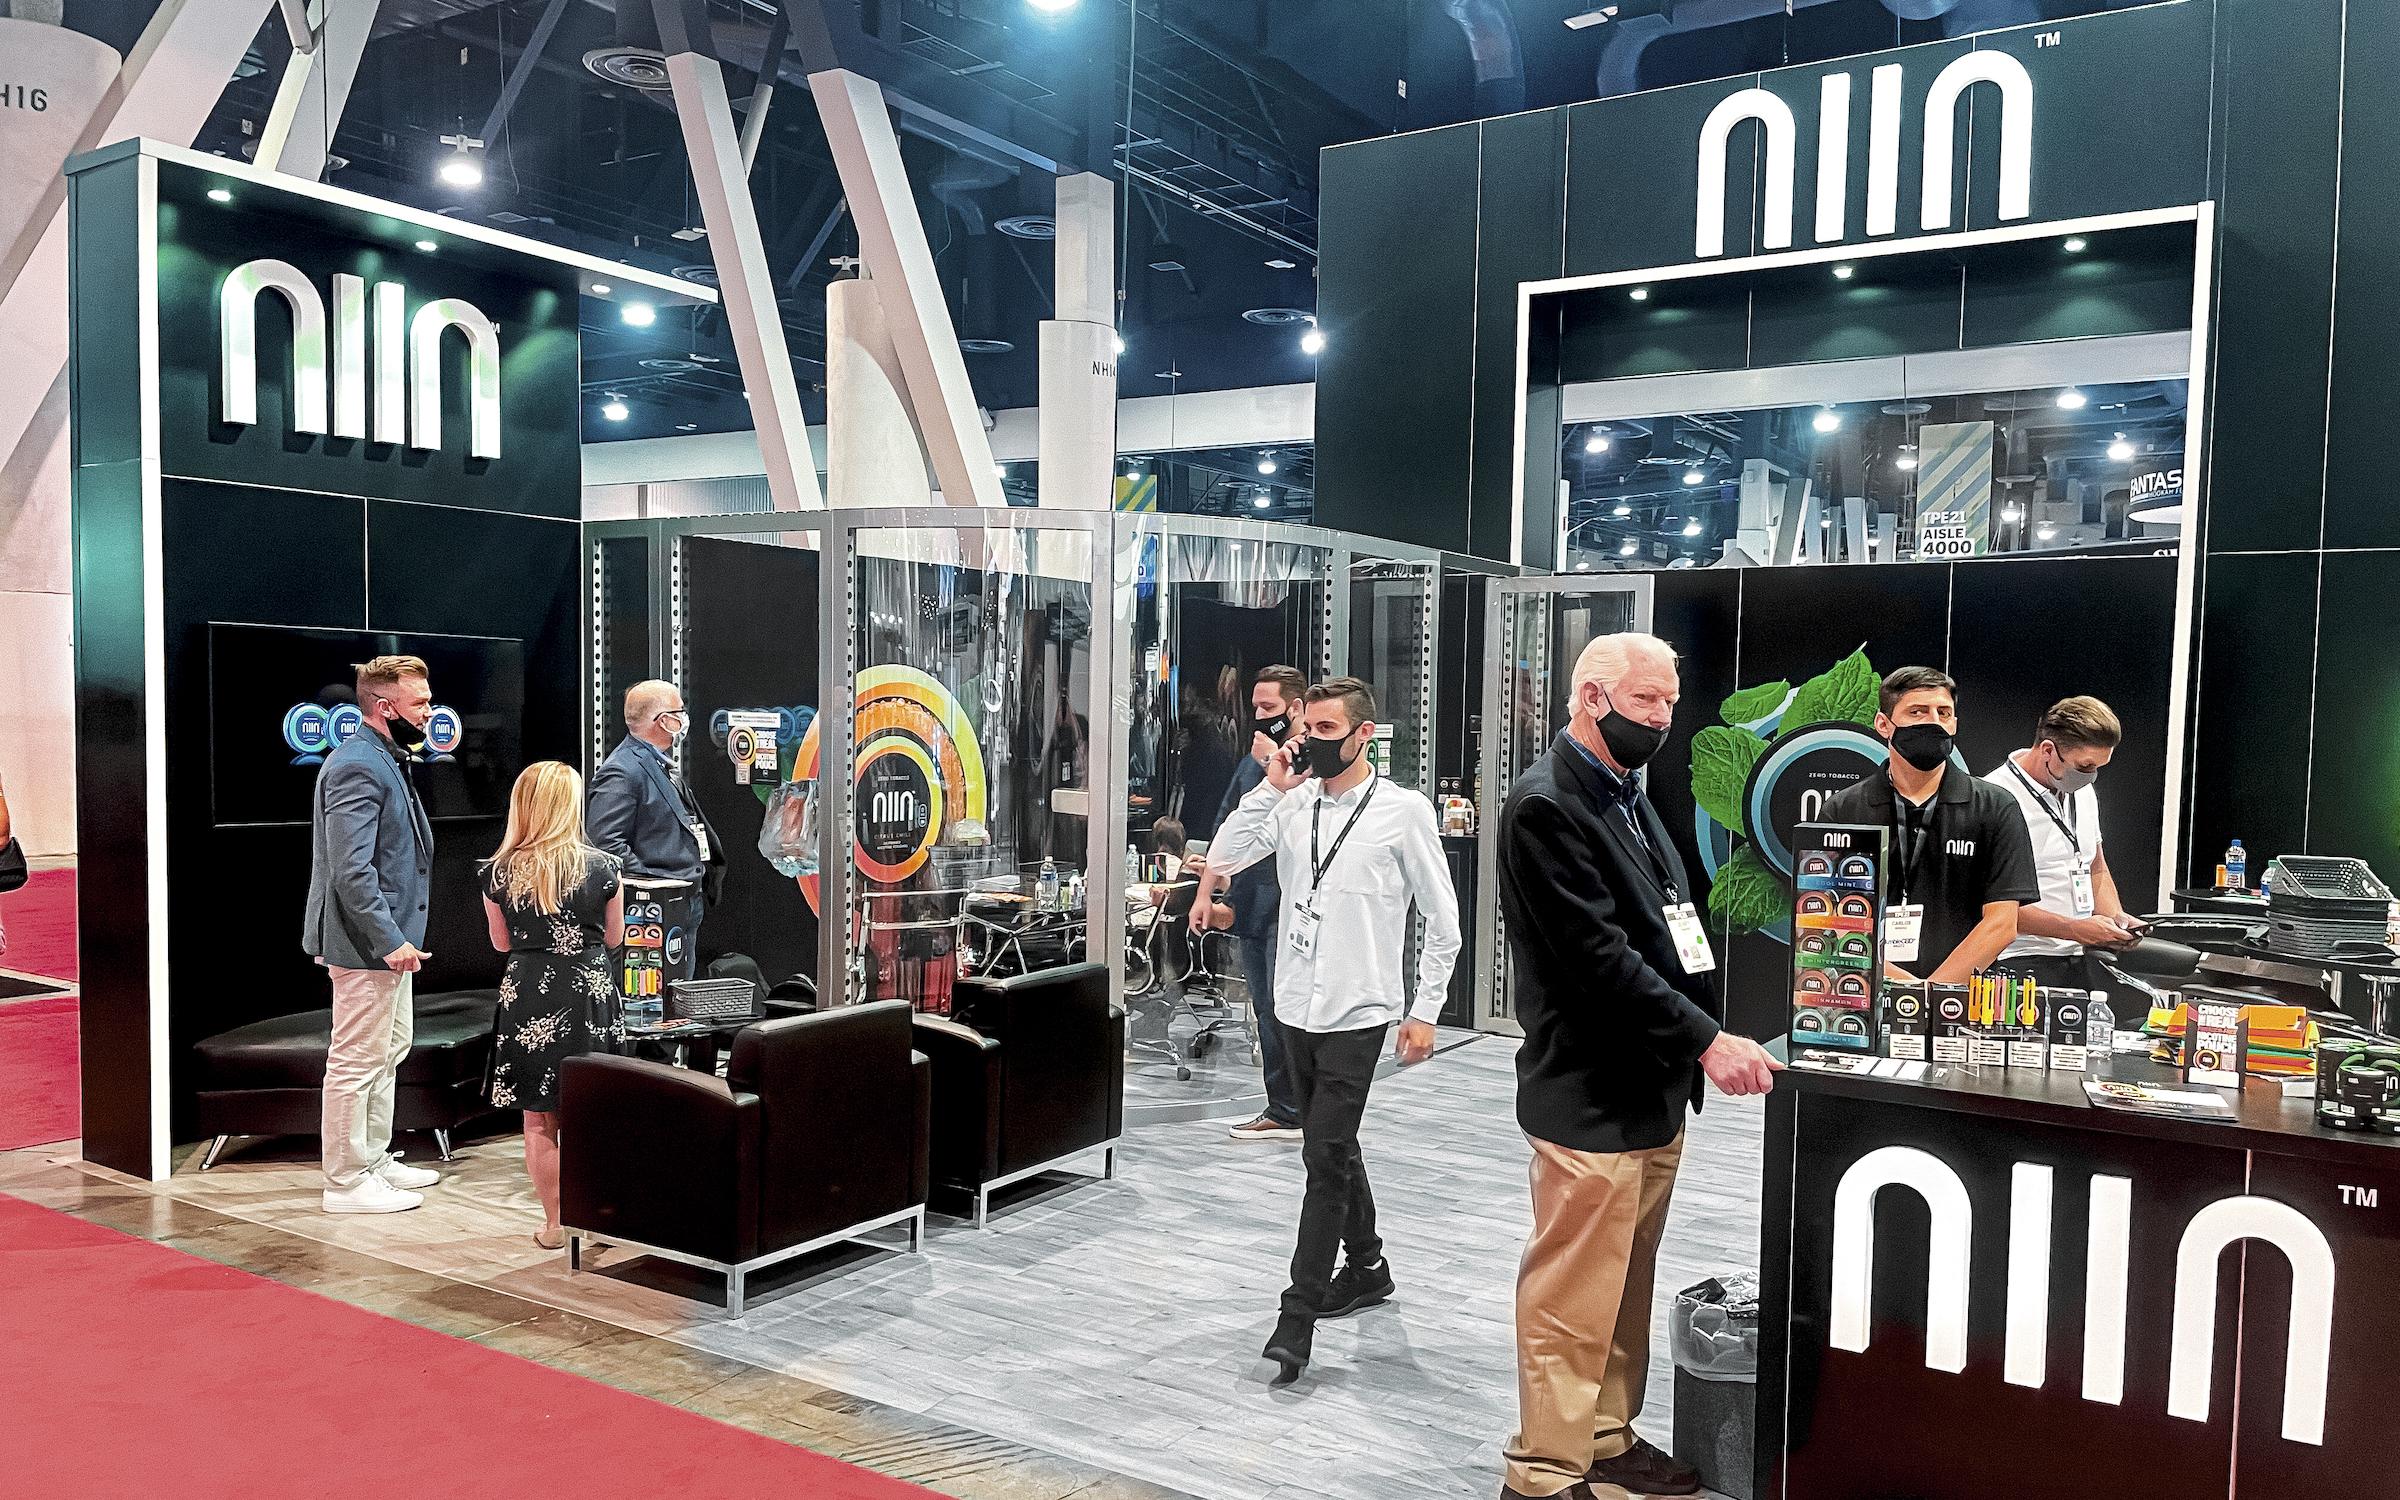 NIIN Showcases Zero Tobacco Product Lineup at Tobacco Plus Expo in Las Vegas